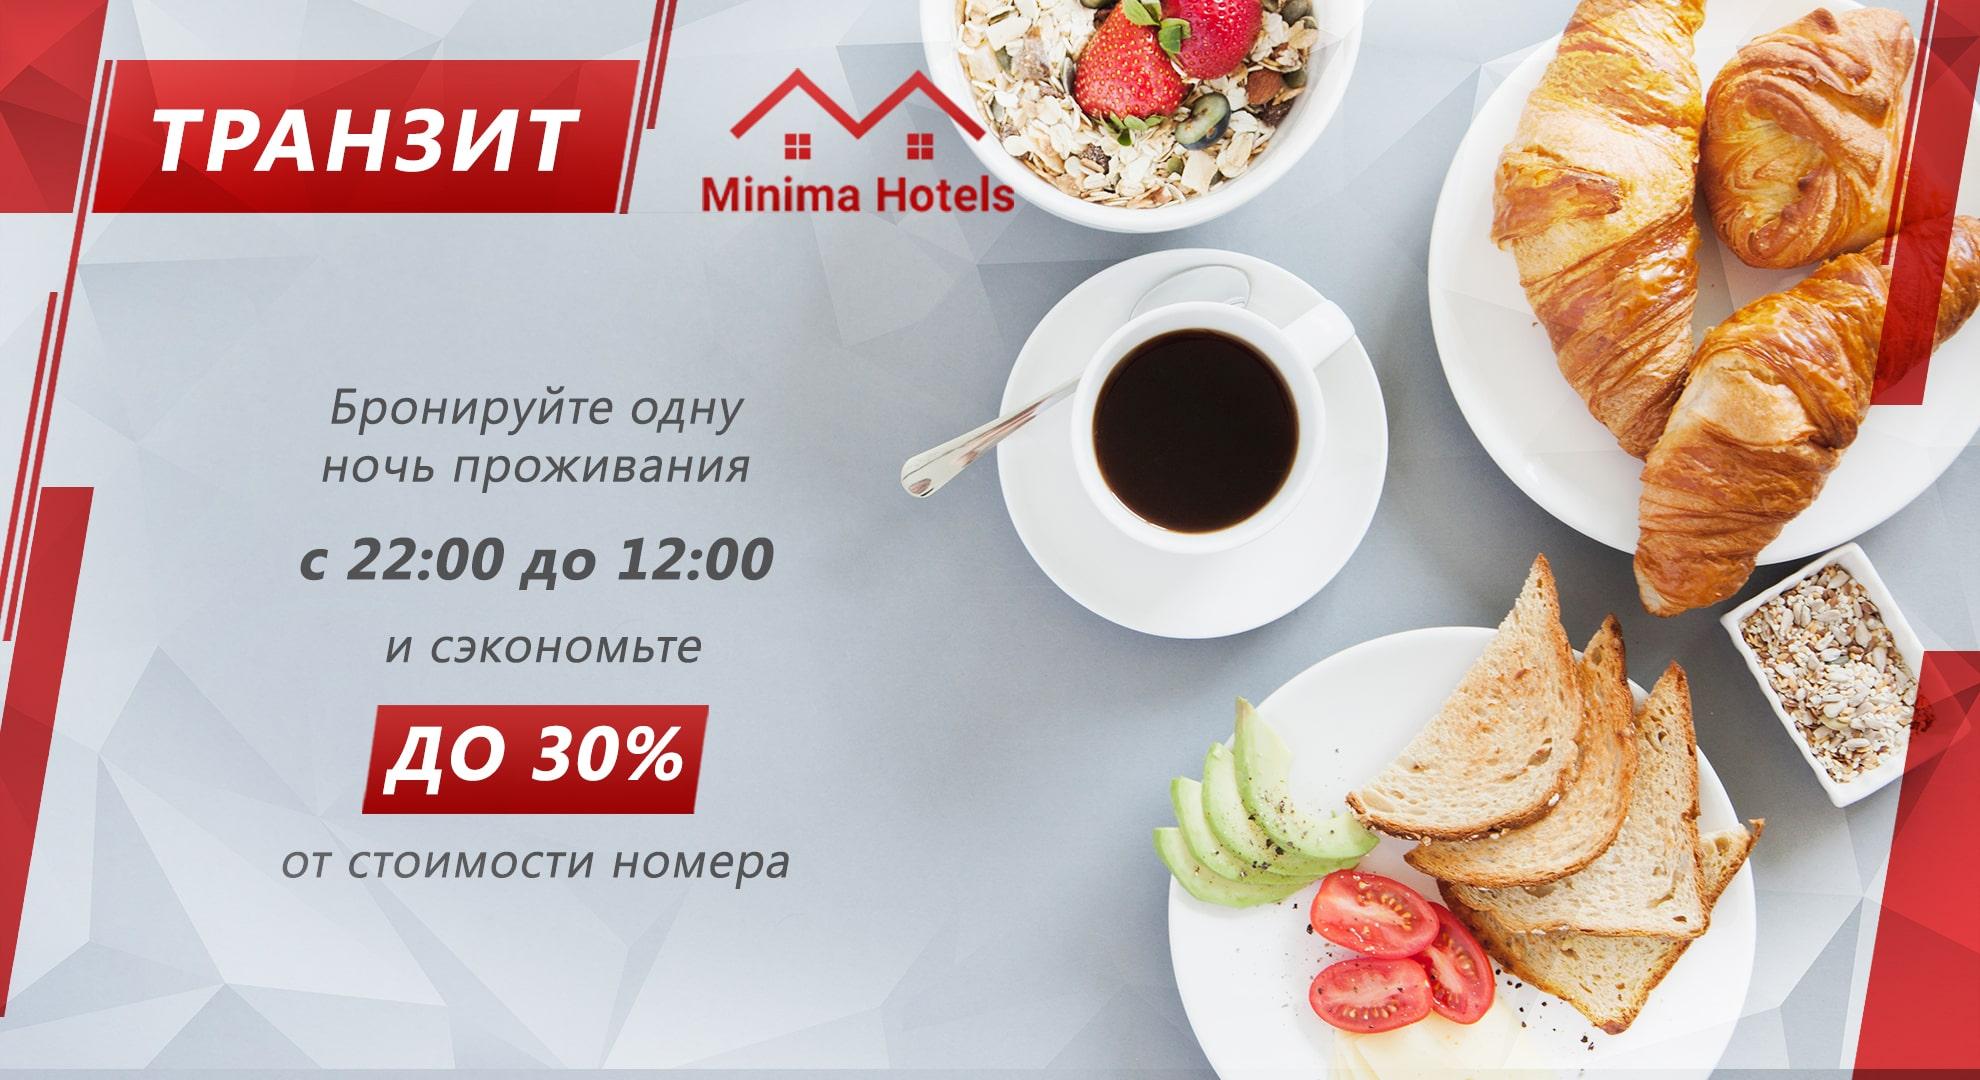 MINIMA HOTELS